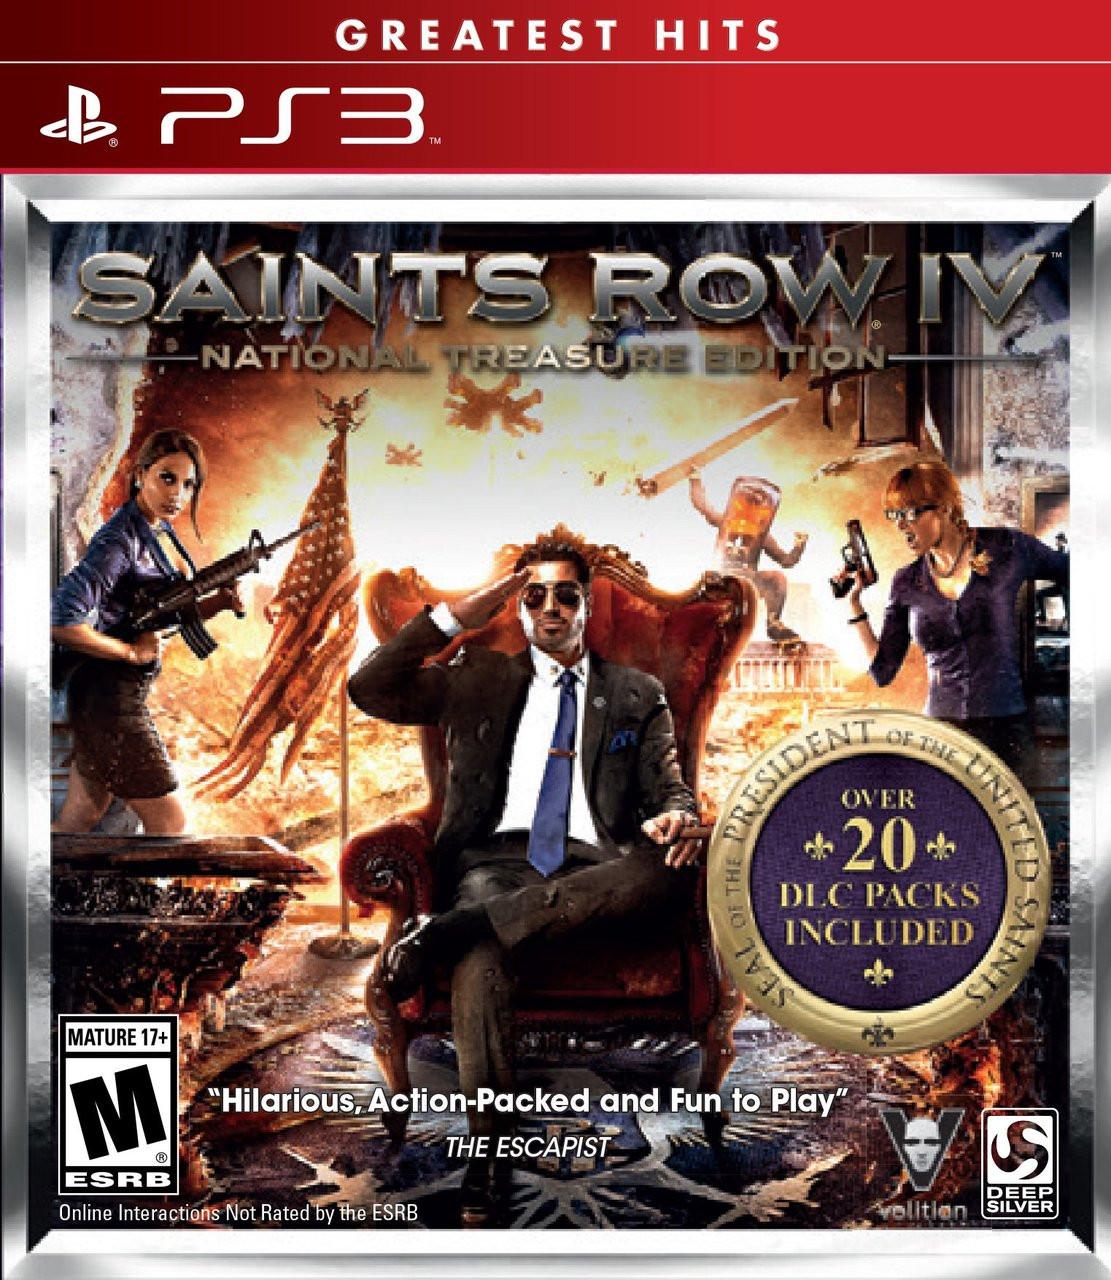 SAINTS ROW IV: NATIONAL TREASURE EDITION - PS3